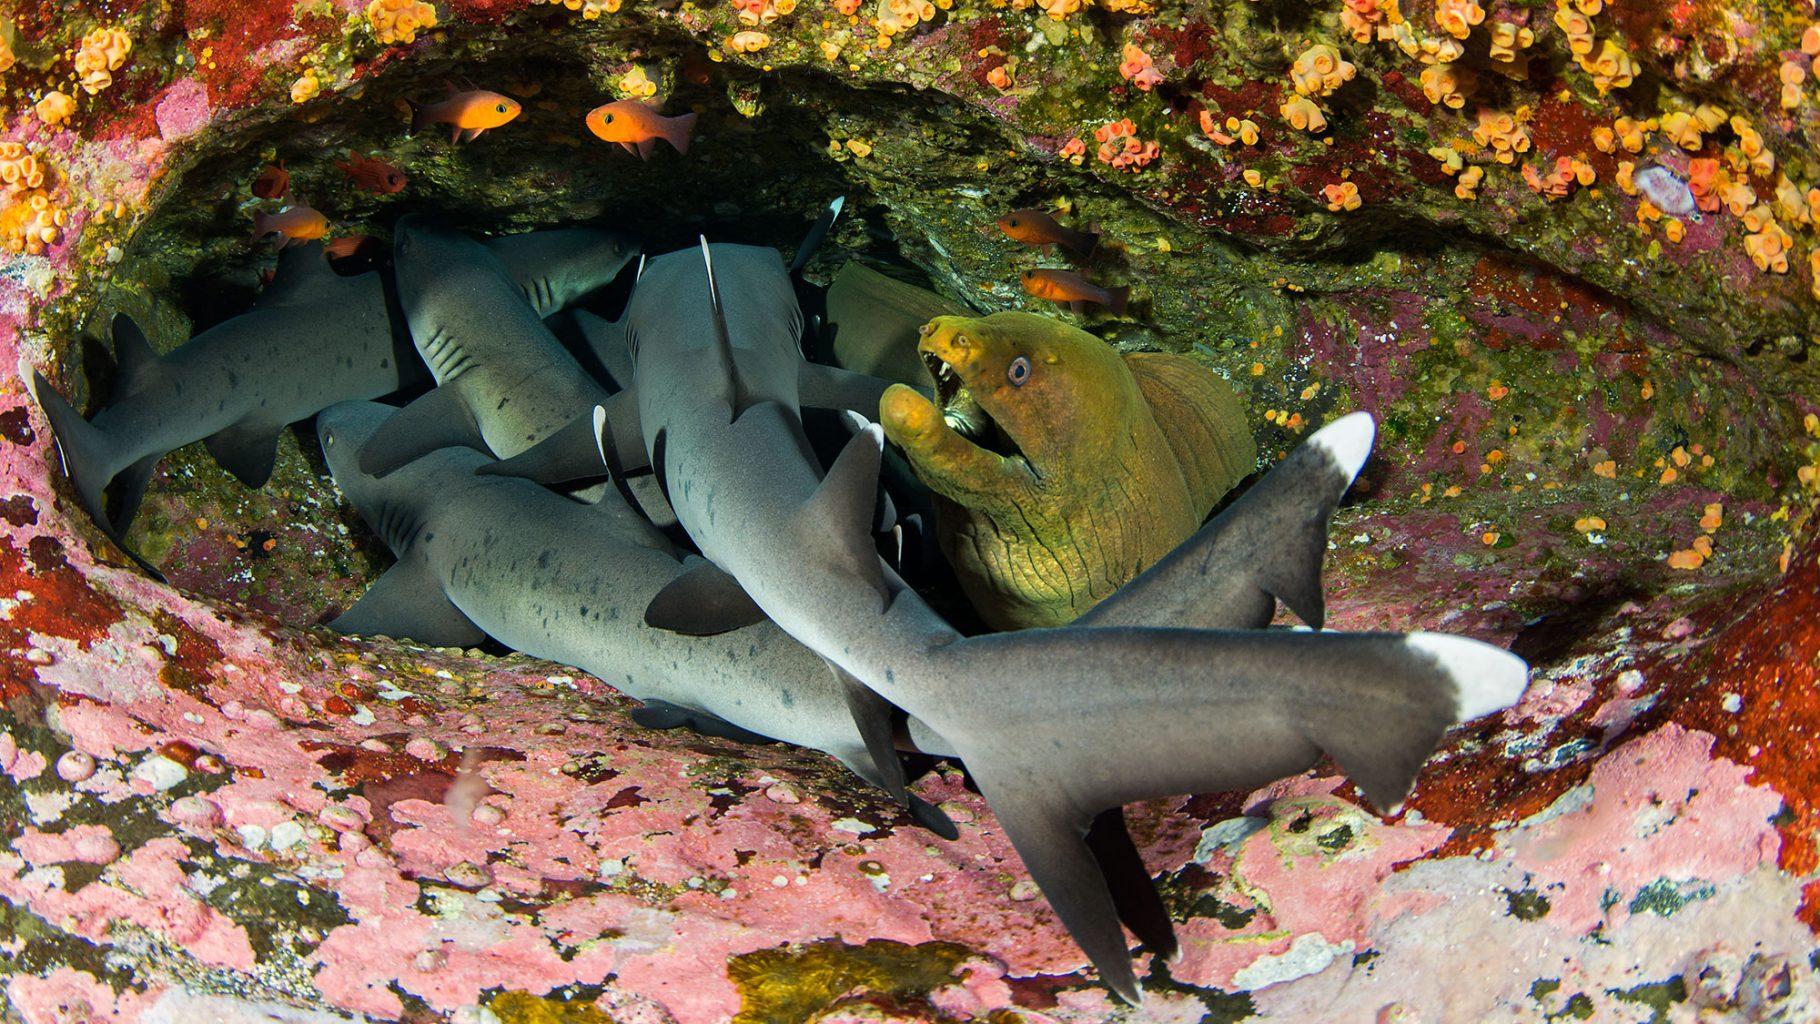 White Reef Sharks and Morey Eel in Cave, Roca Partida Revillagigedo ( Socorro ) Islands, Mexico